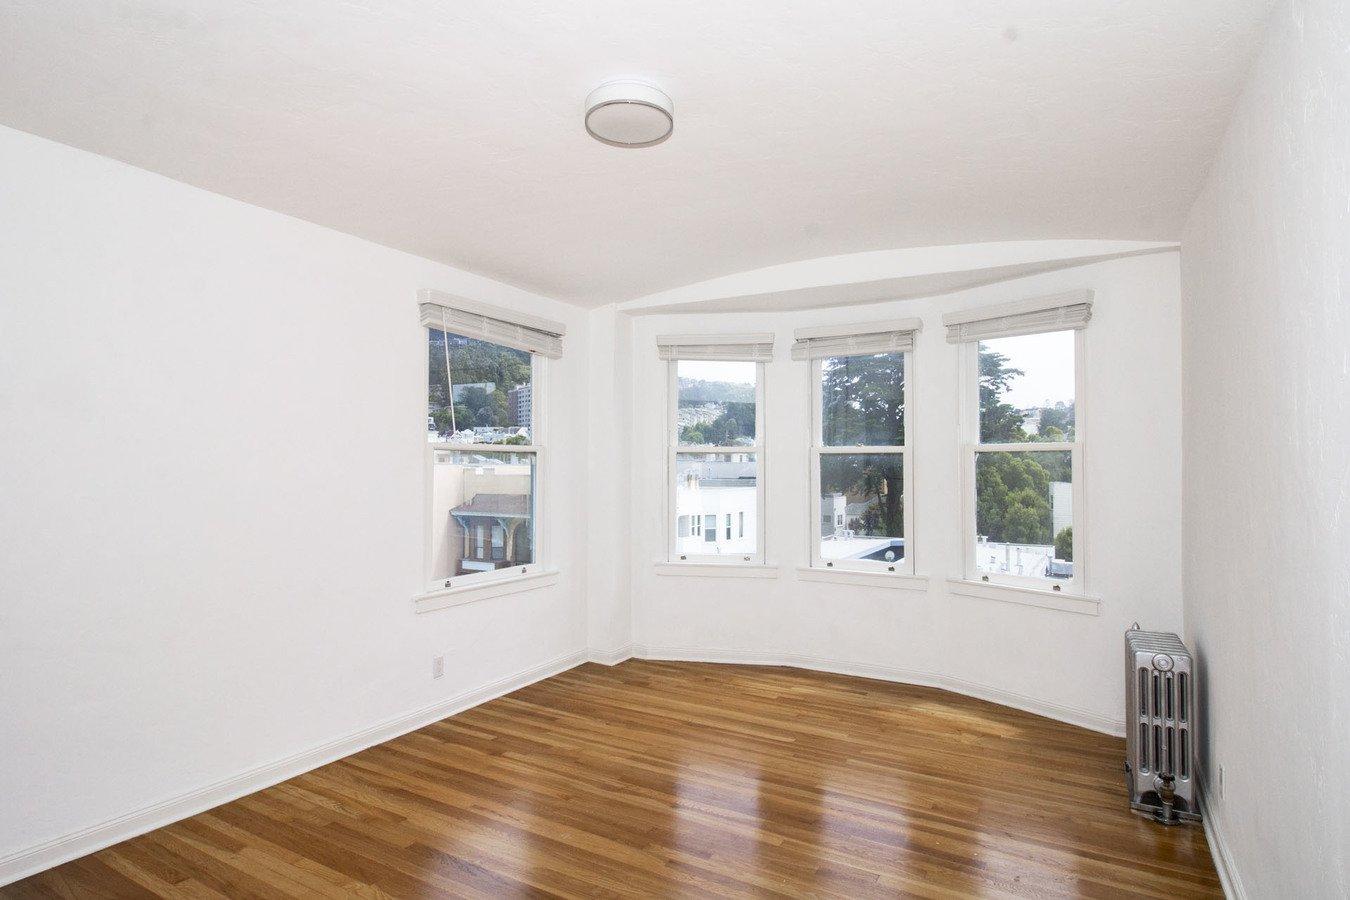 2 Bedrooms 1 Bathroom Apartment for rent at 350 Judah Apartments in San Francisco, CA